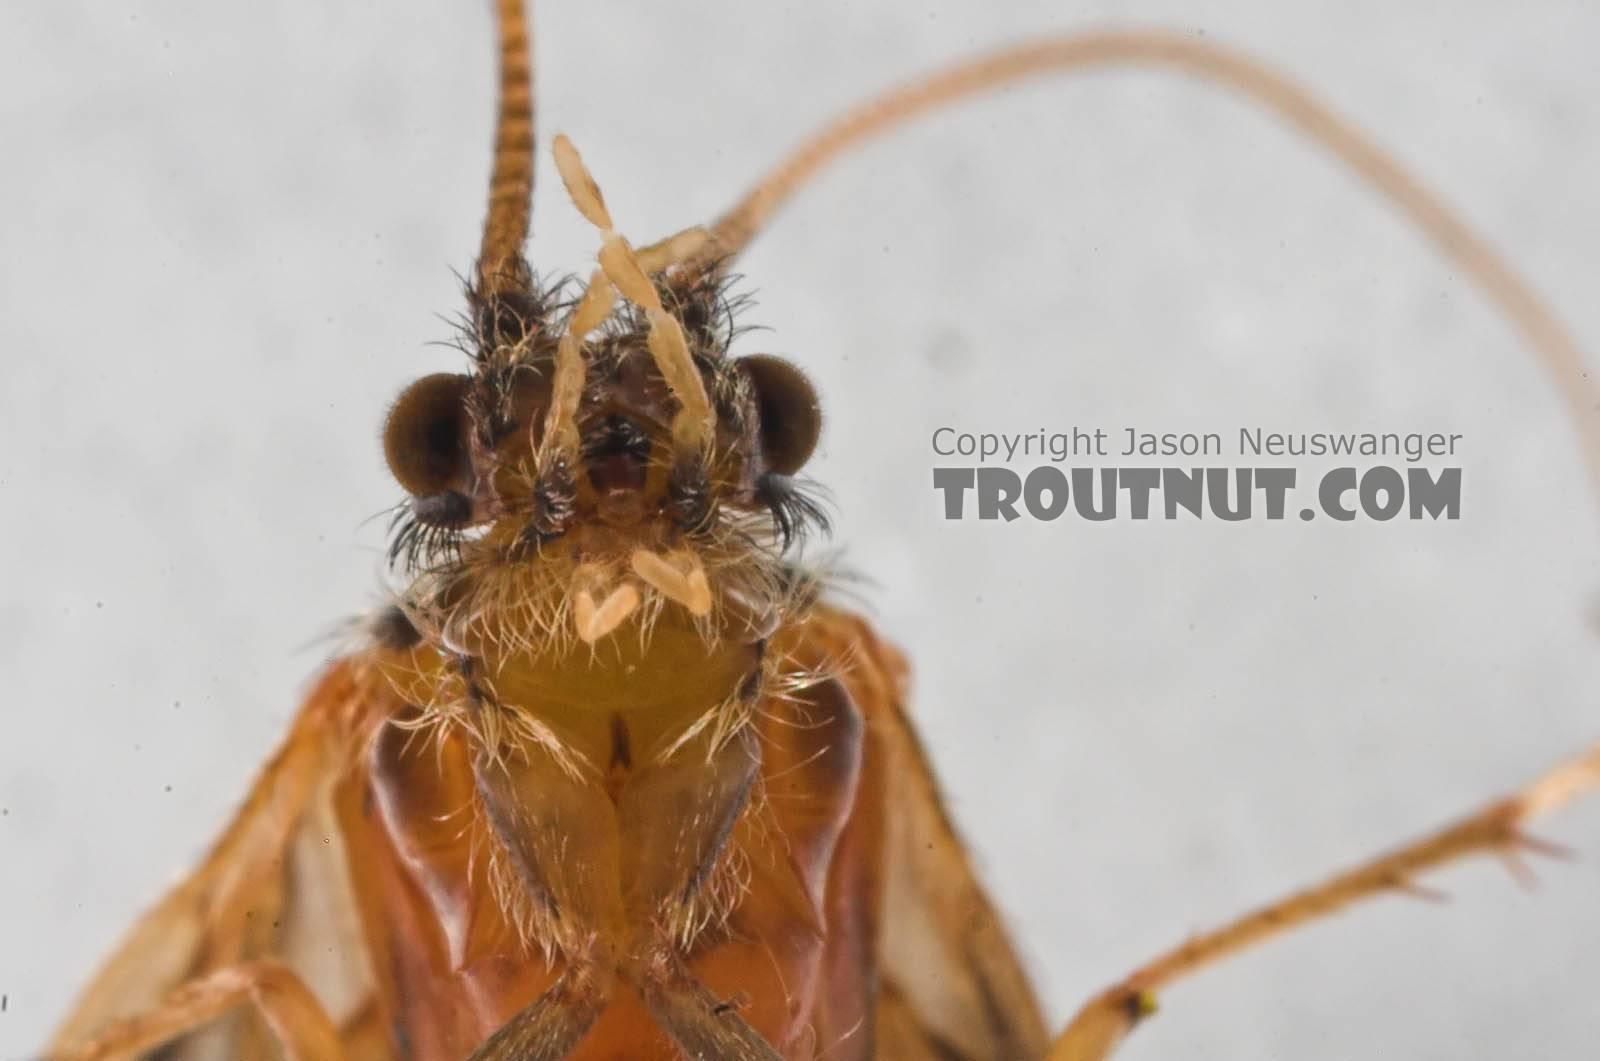 Brachycentrus appalachia (Apple Caddis) Caddisfly Adult from the Beaverkill River in New York